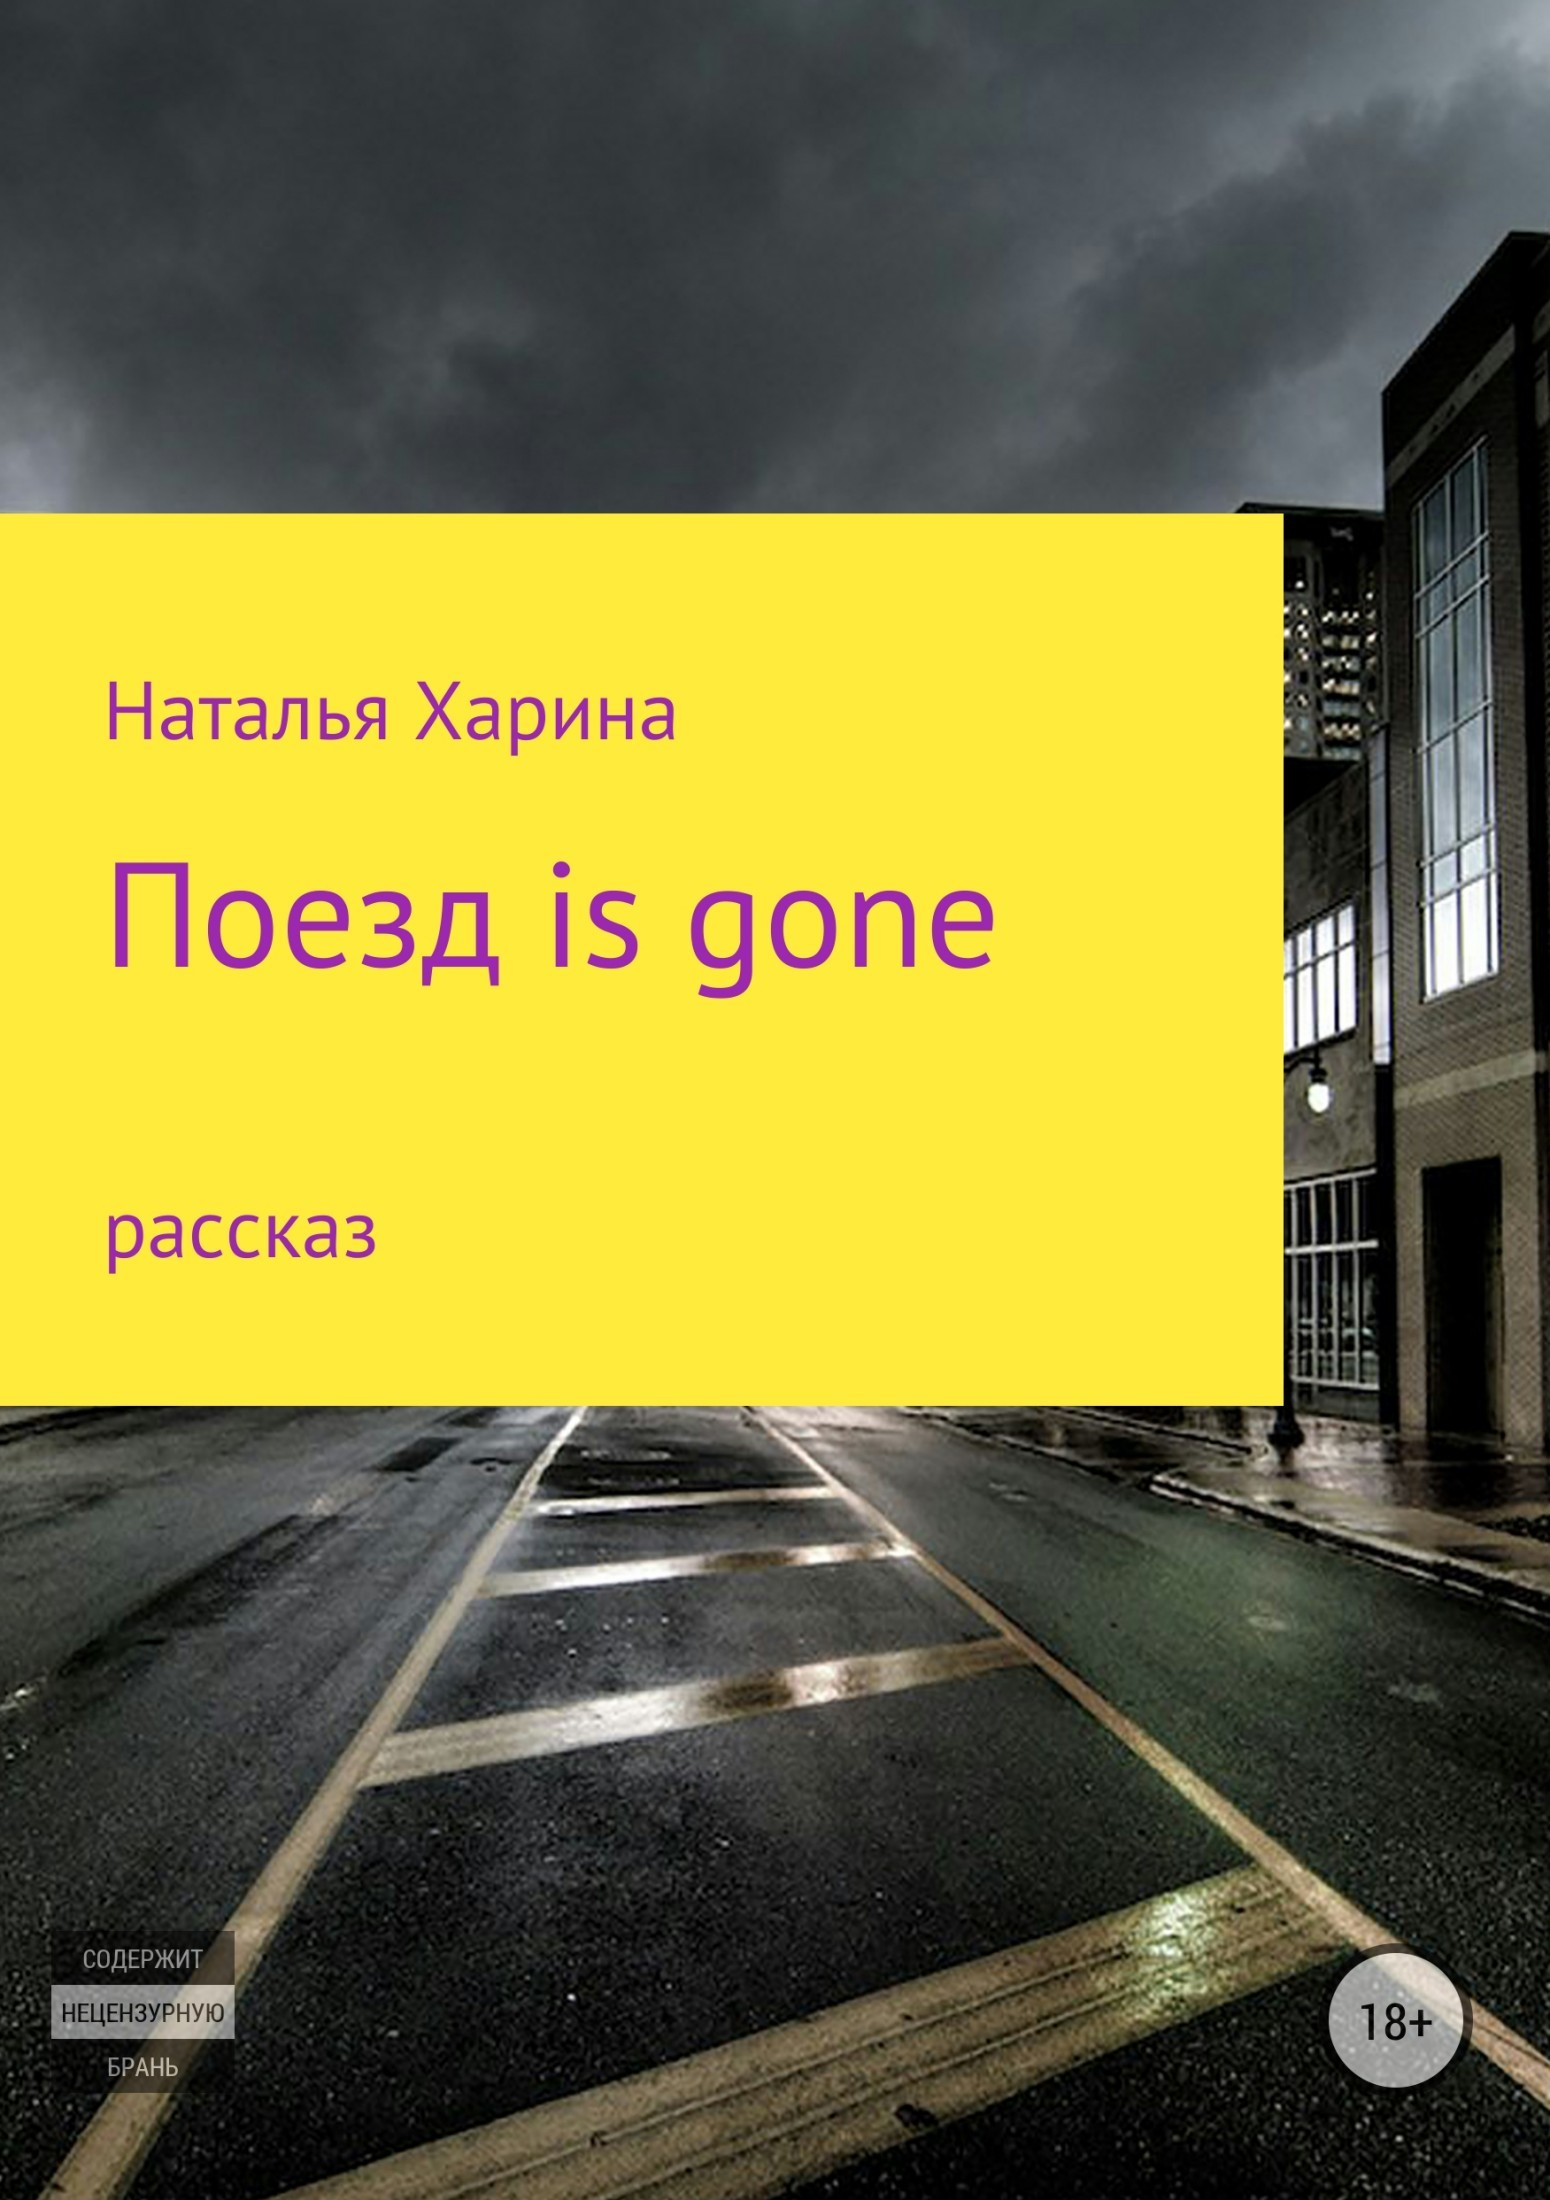 Наталья Владимировна Харина Поезд is gone magnetiq женщинам